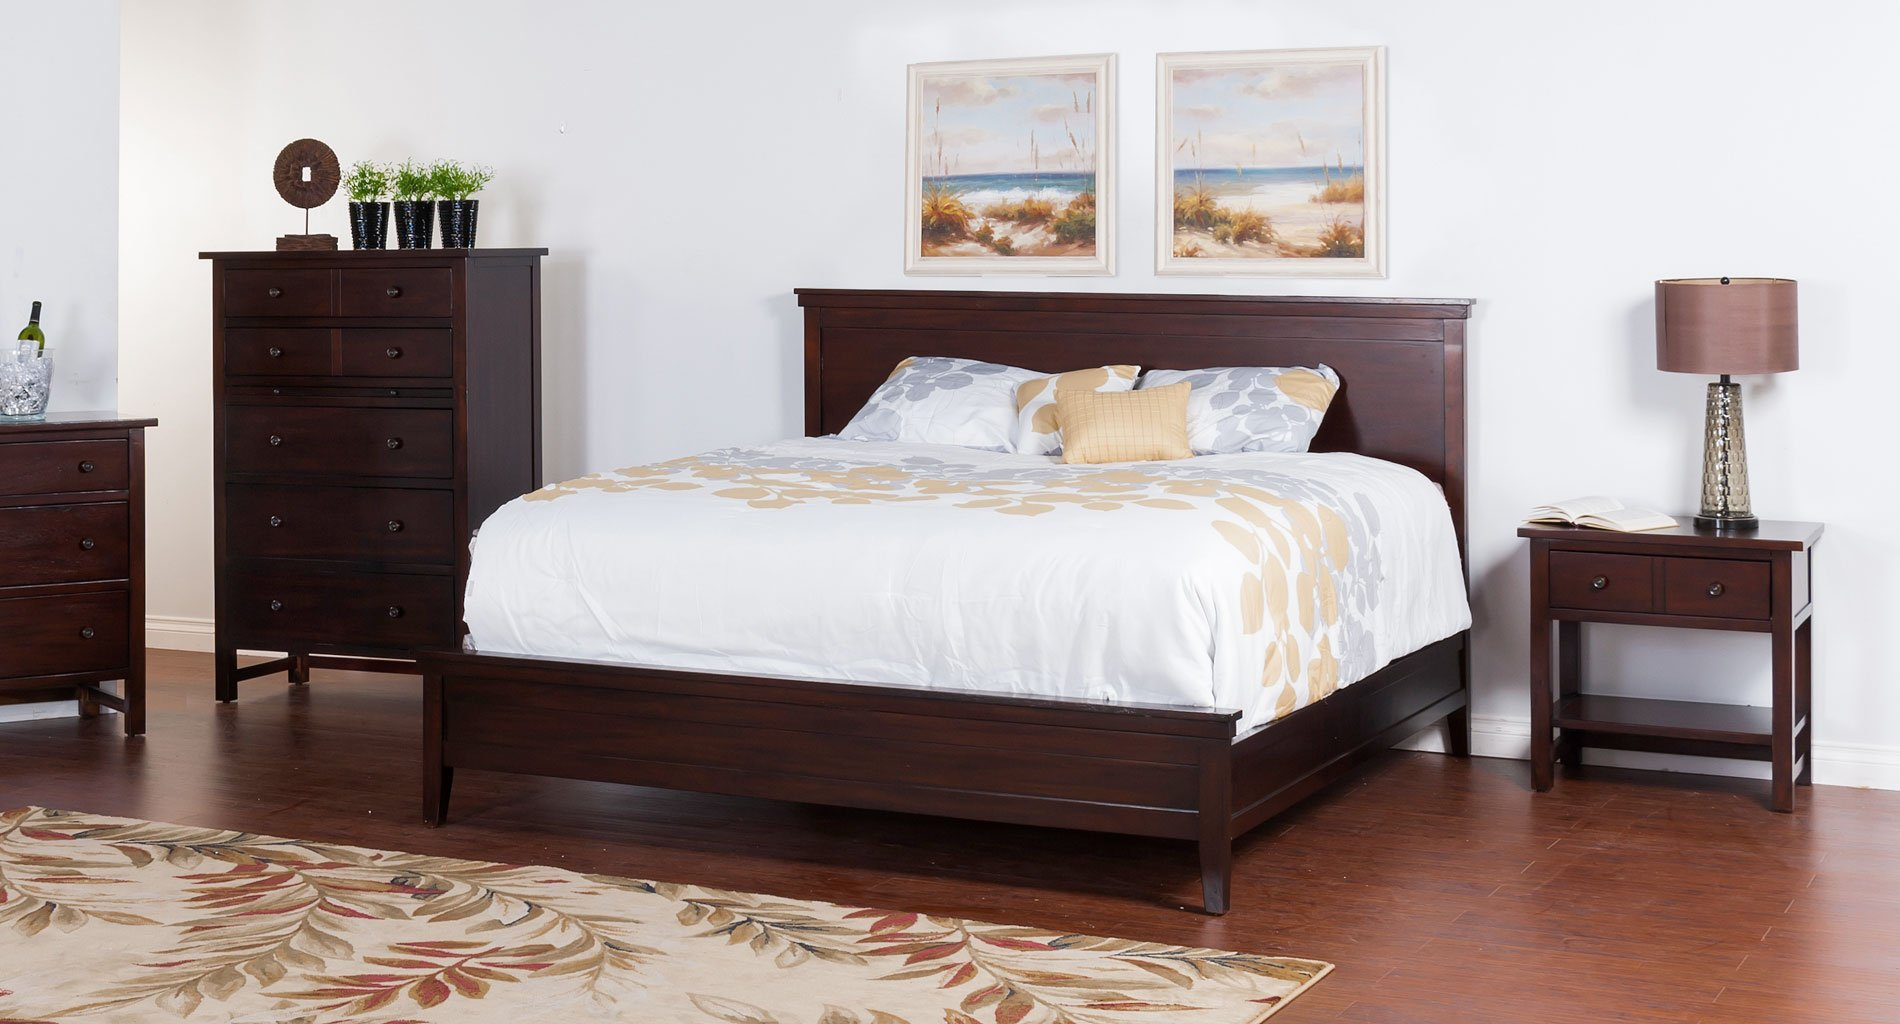 Napa panel bedroom set sunny designs furniture cart for Sunny designs bedroom furniture